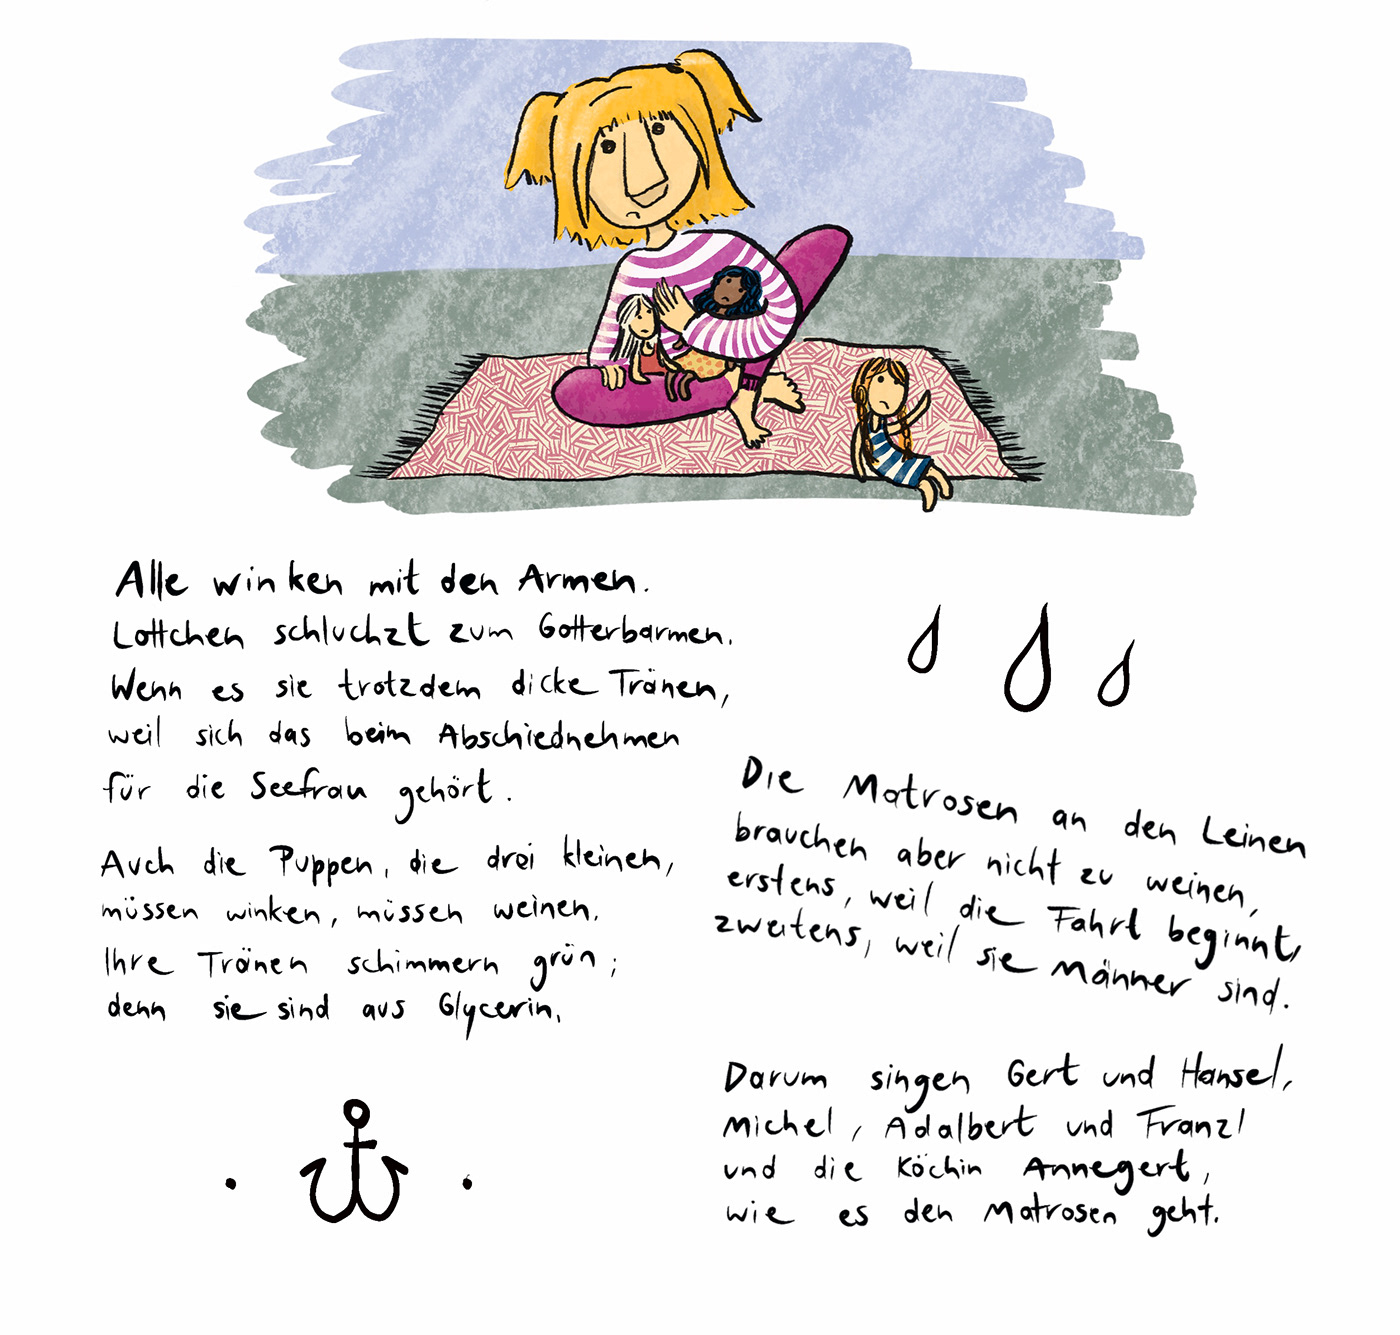 Image may contain: cartoon, illustration and handwriting